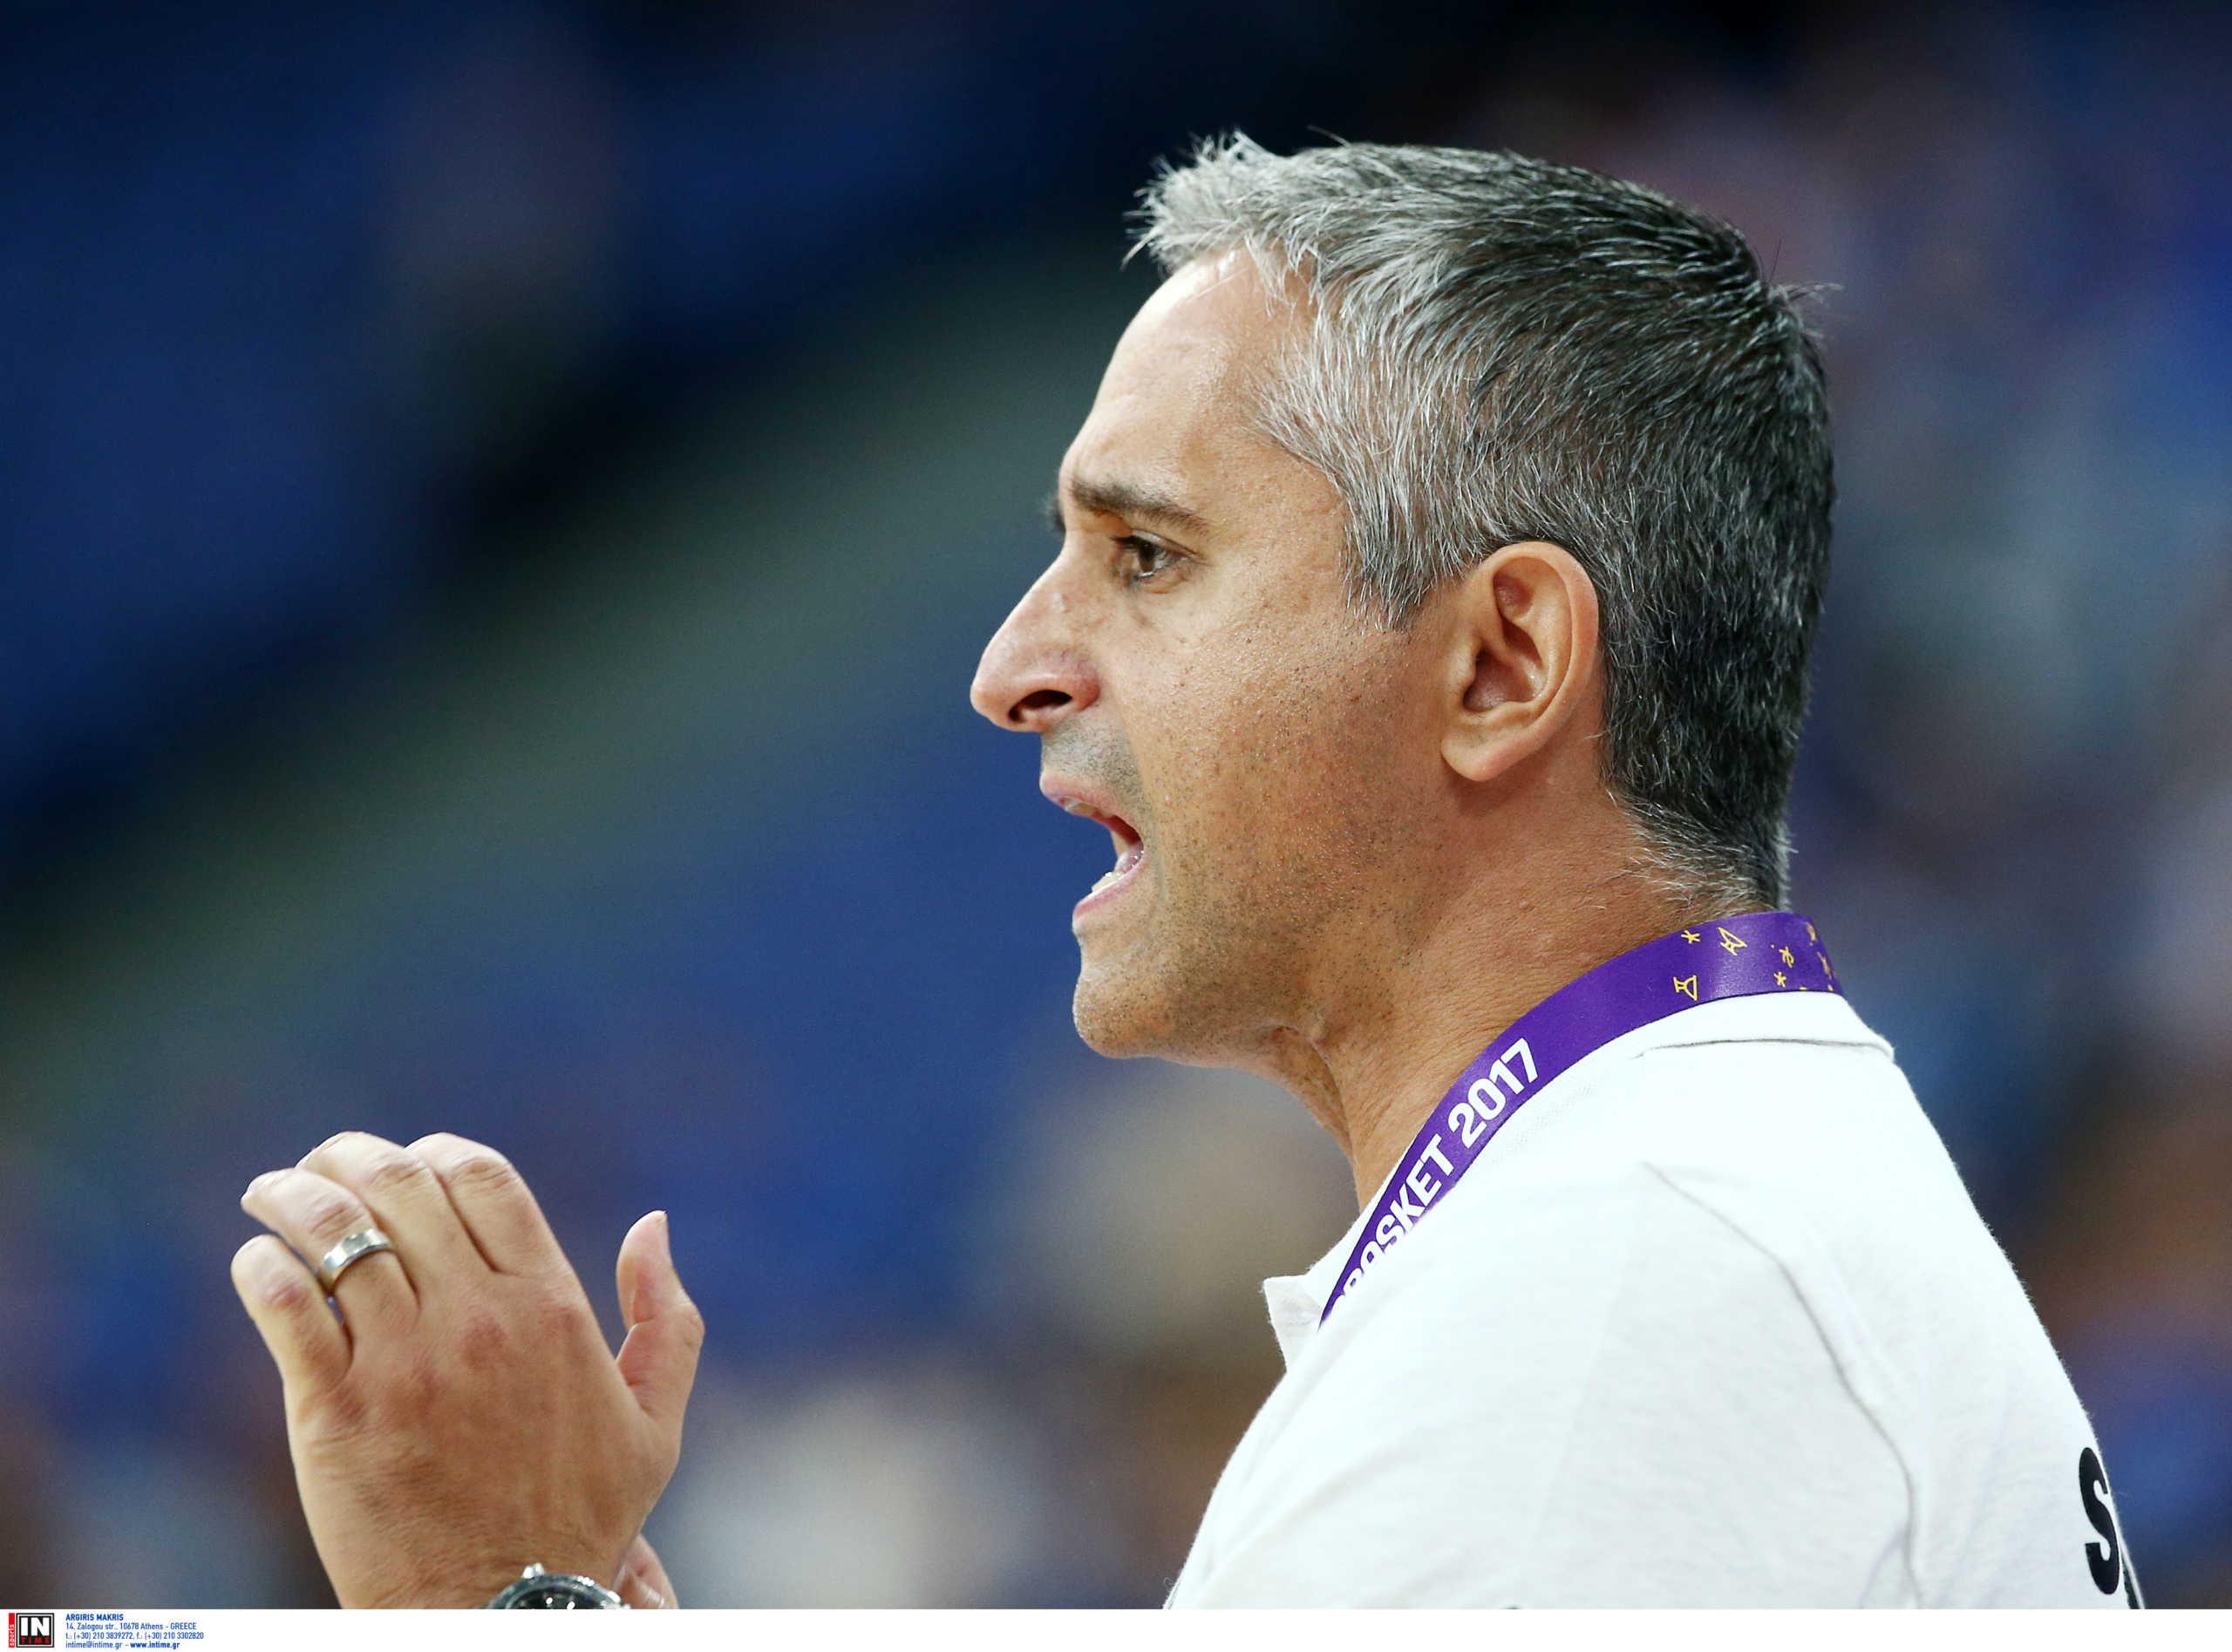 Euroleague: Παρελθόν ο Κοκόσκοφ από την Φενέρμπαχτσε, θα συνεχίσει στο NBA